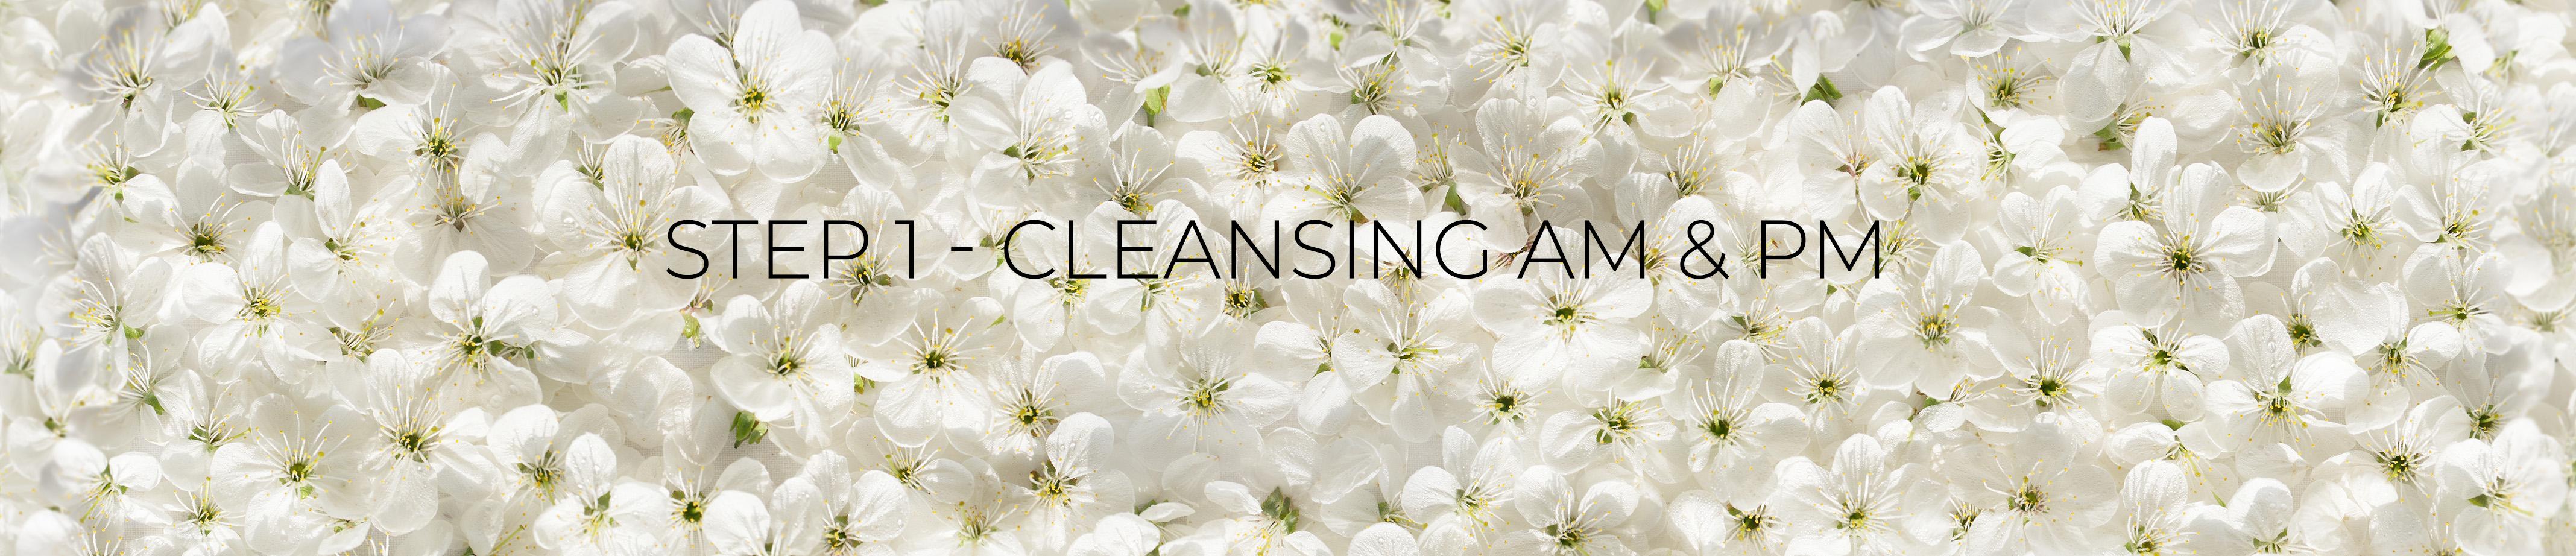 cleansing-new-header.jpg